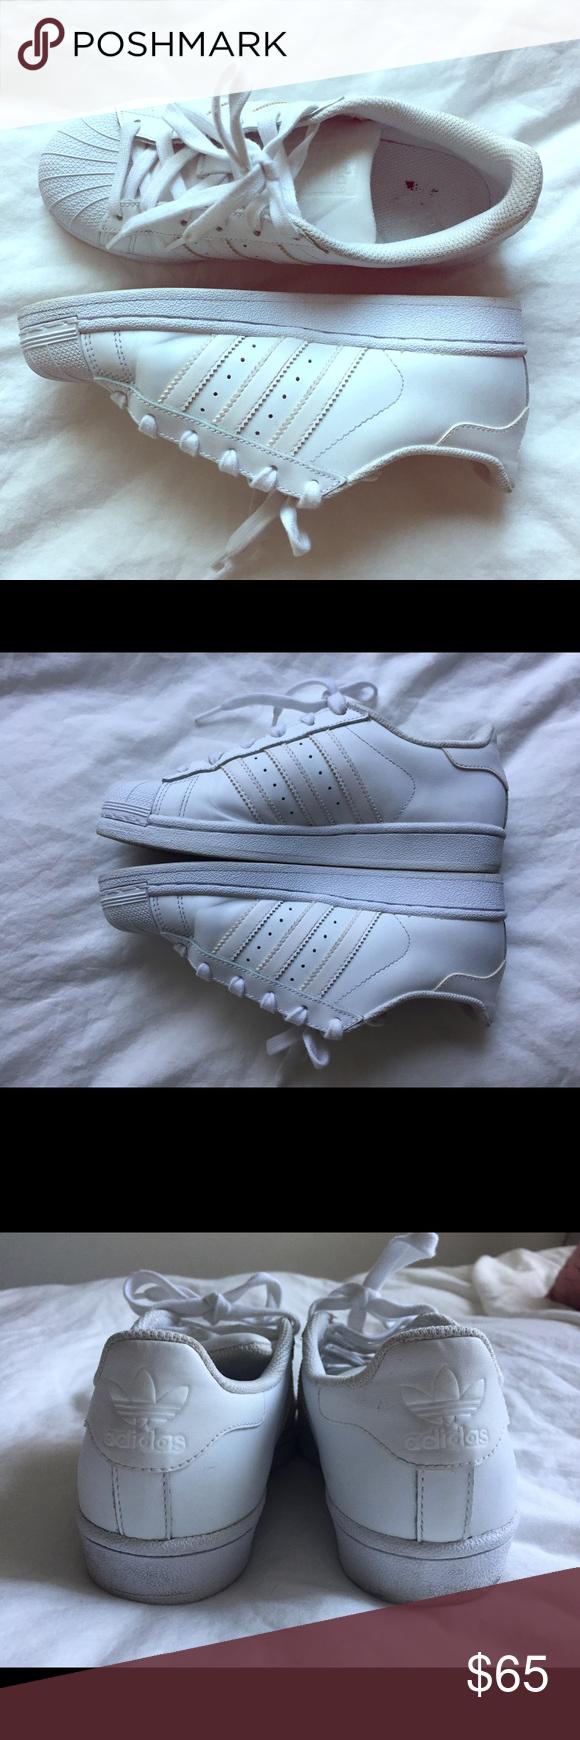 Adidas superstar originali in bianco pinterest superstar originale